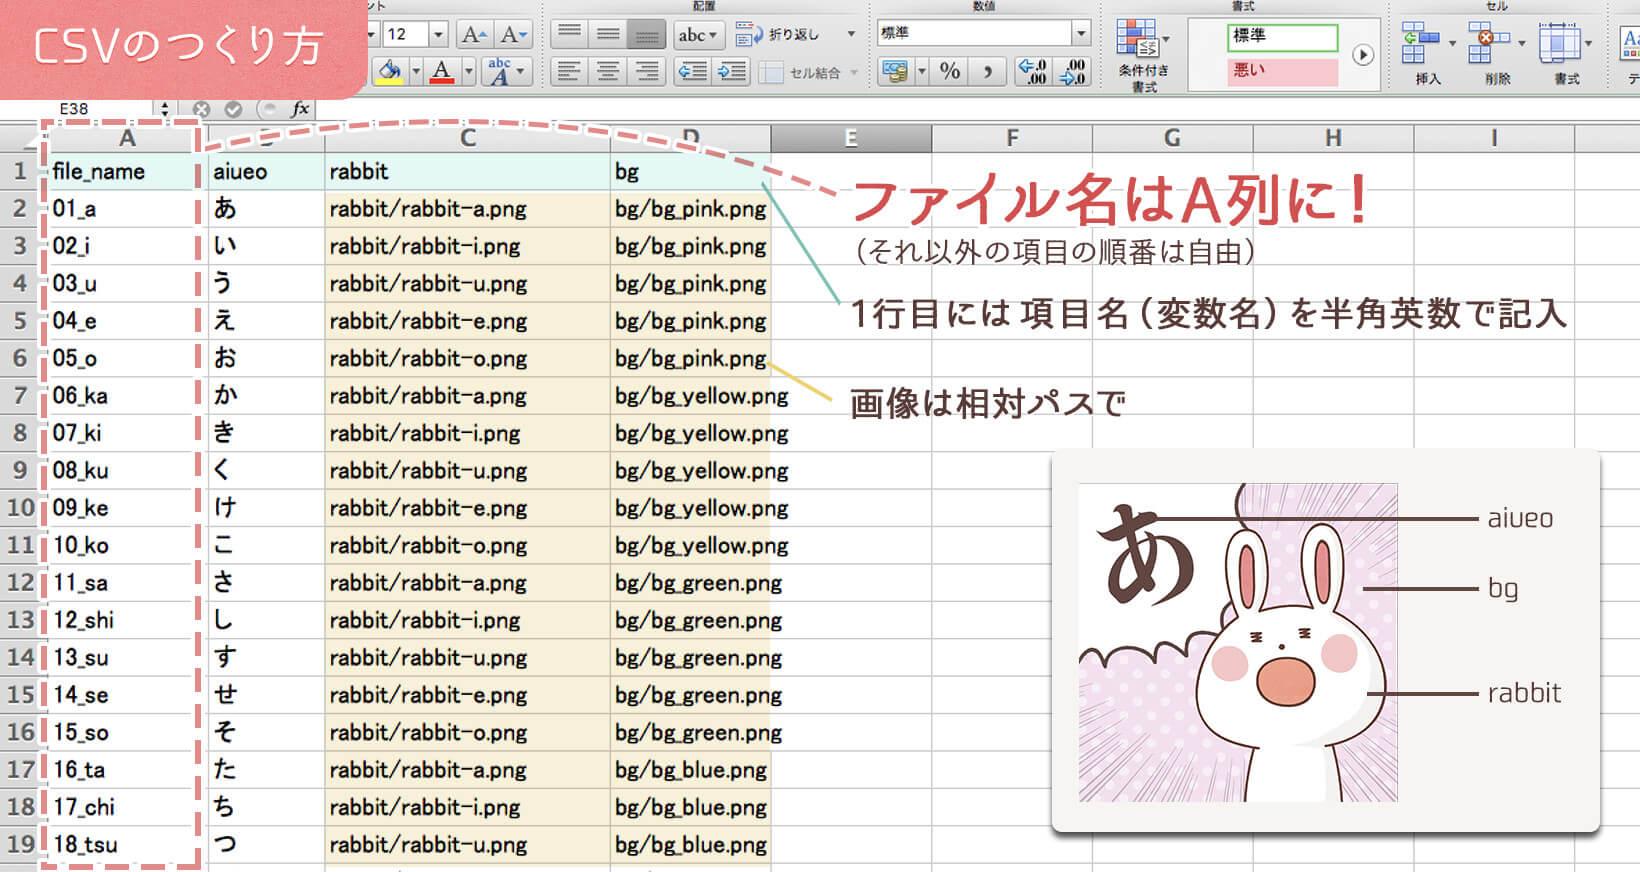 hotoshop CSV データセット 変数 量産 書き出し 効率化